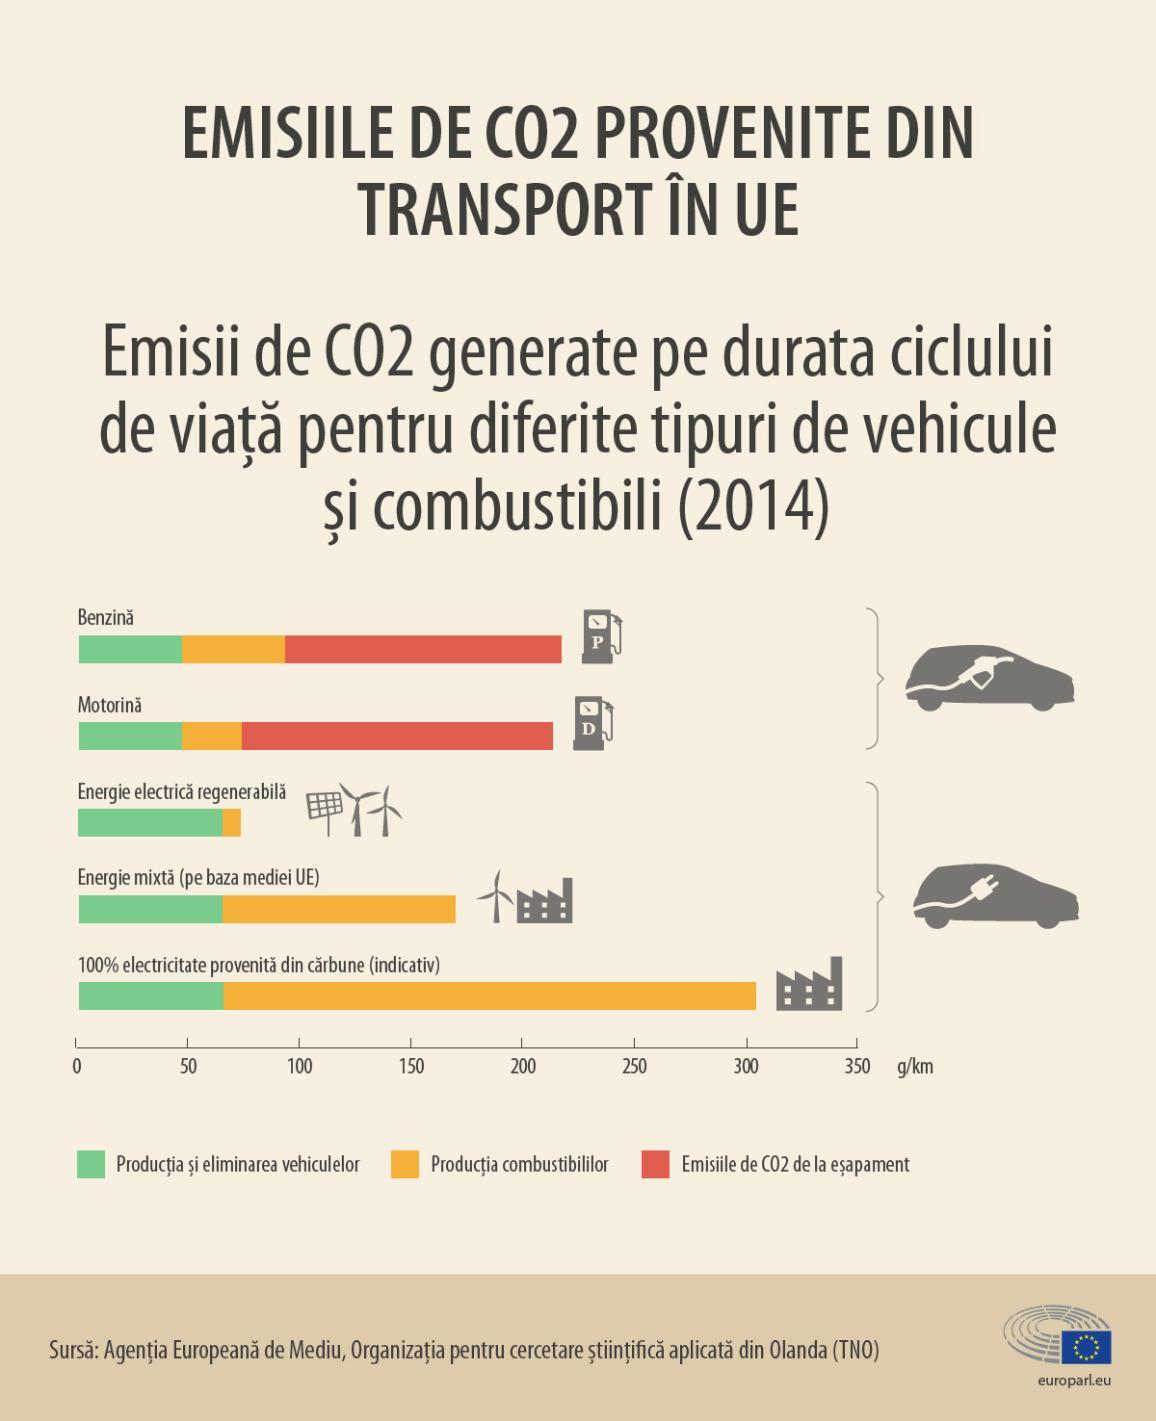 Emisii de CO2 pe tipuri de combustibili